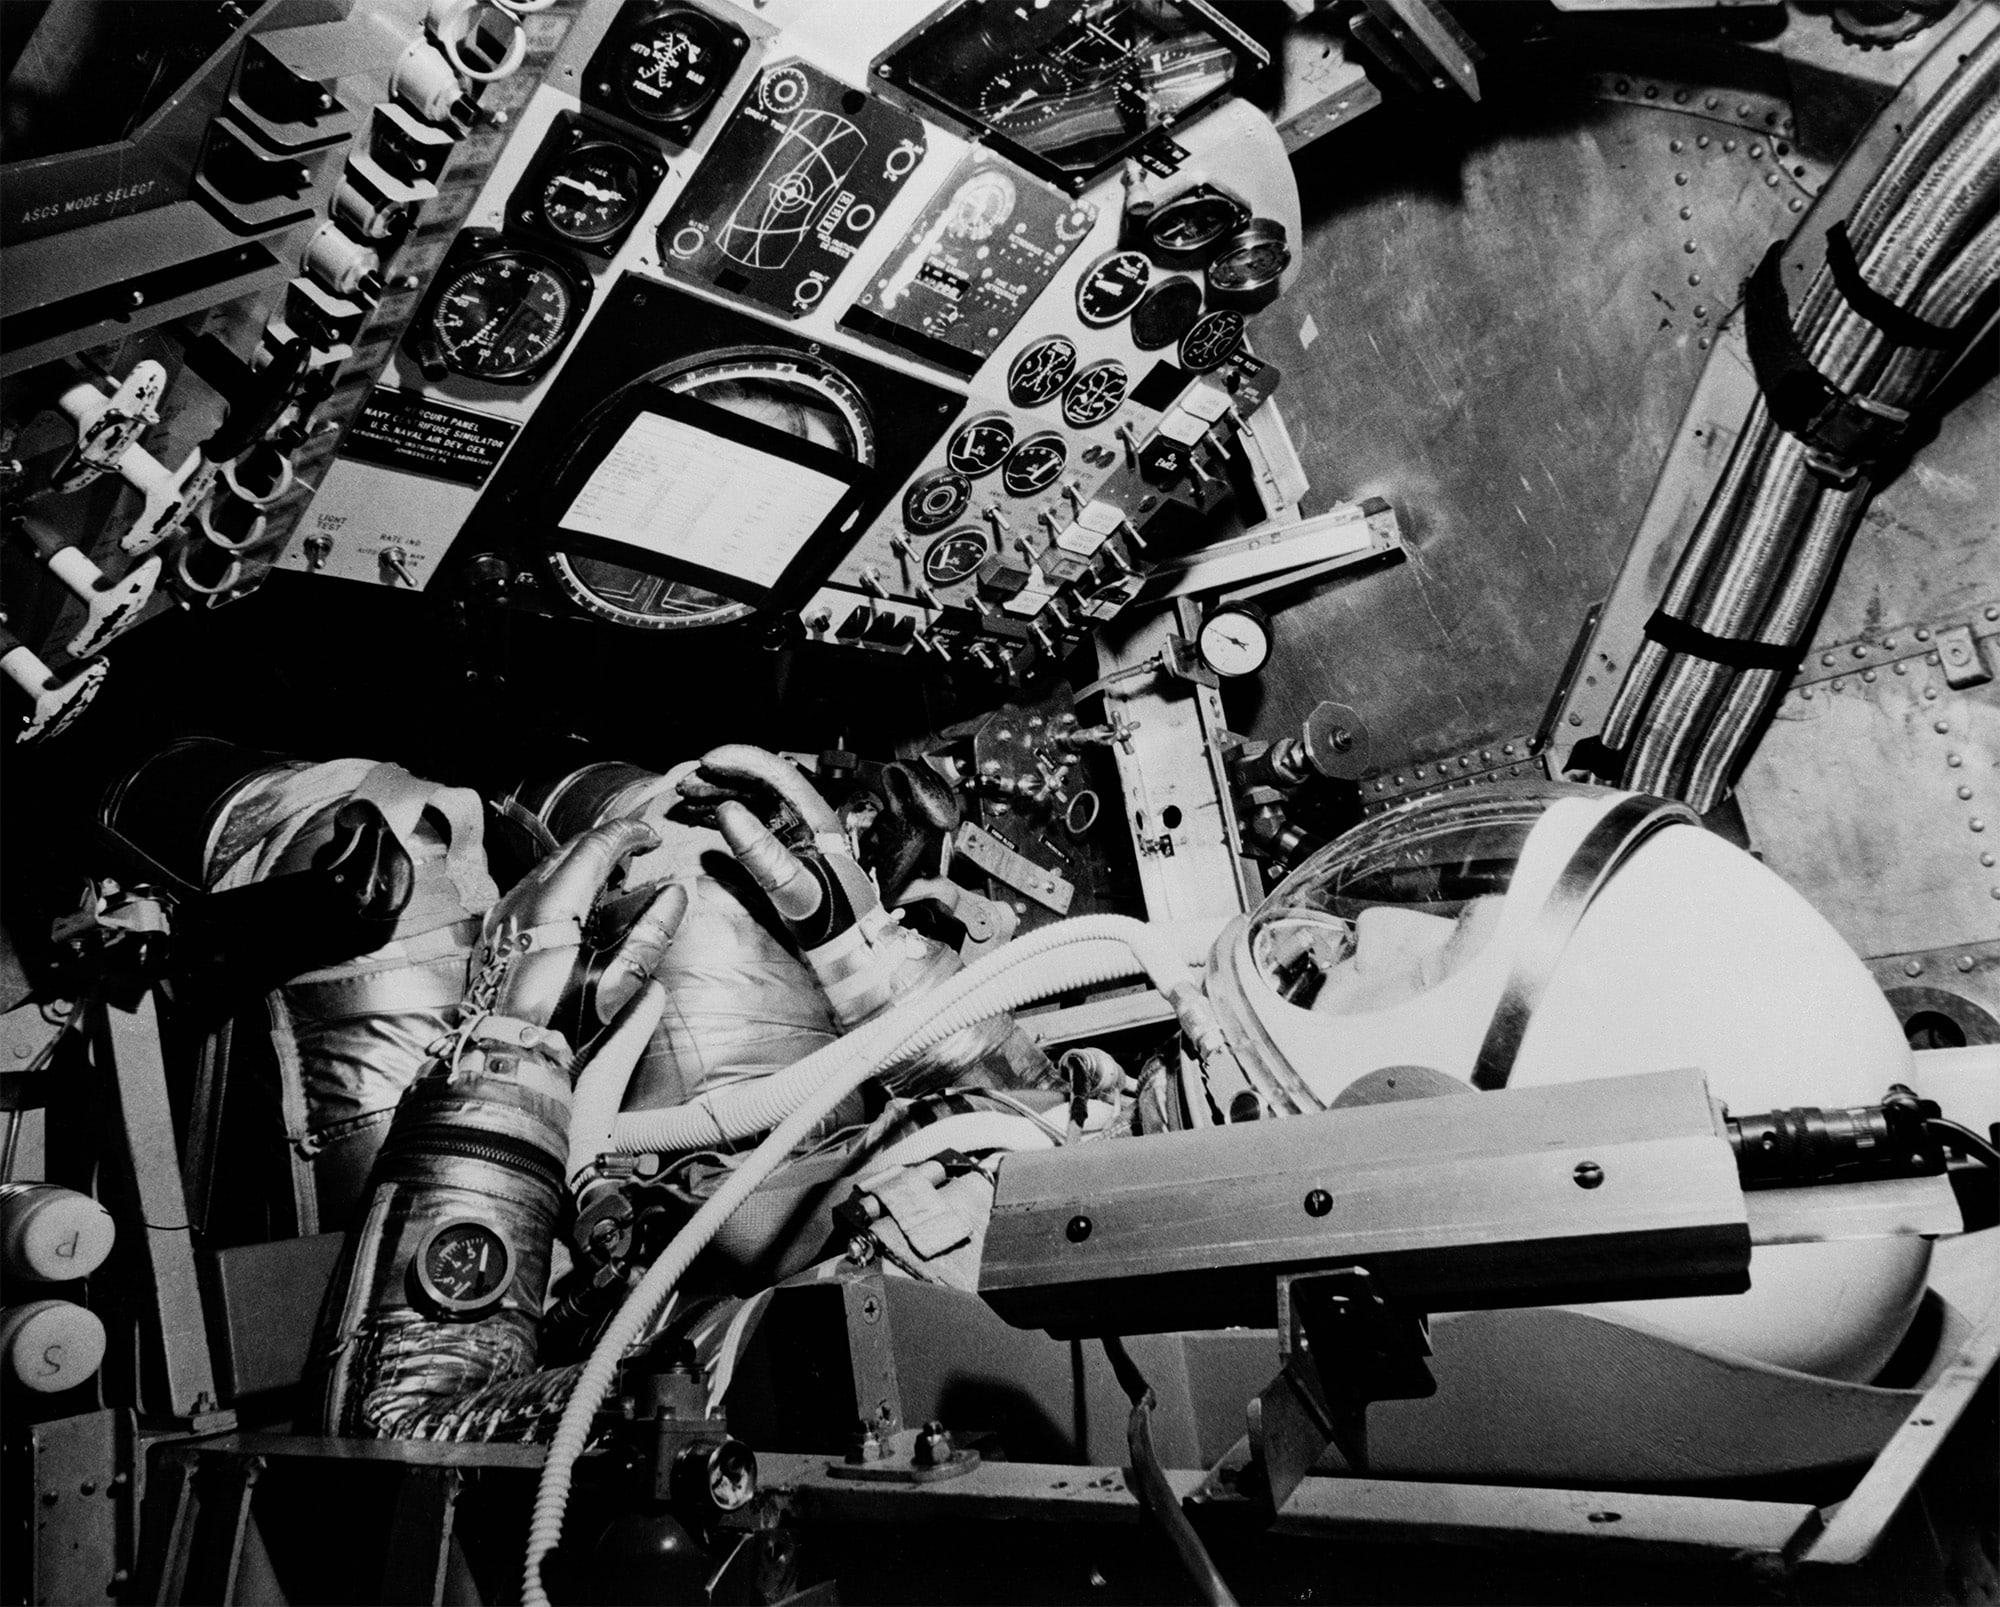 Unutrašnjost Mercuryja (Credit: NASA)